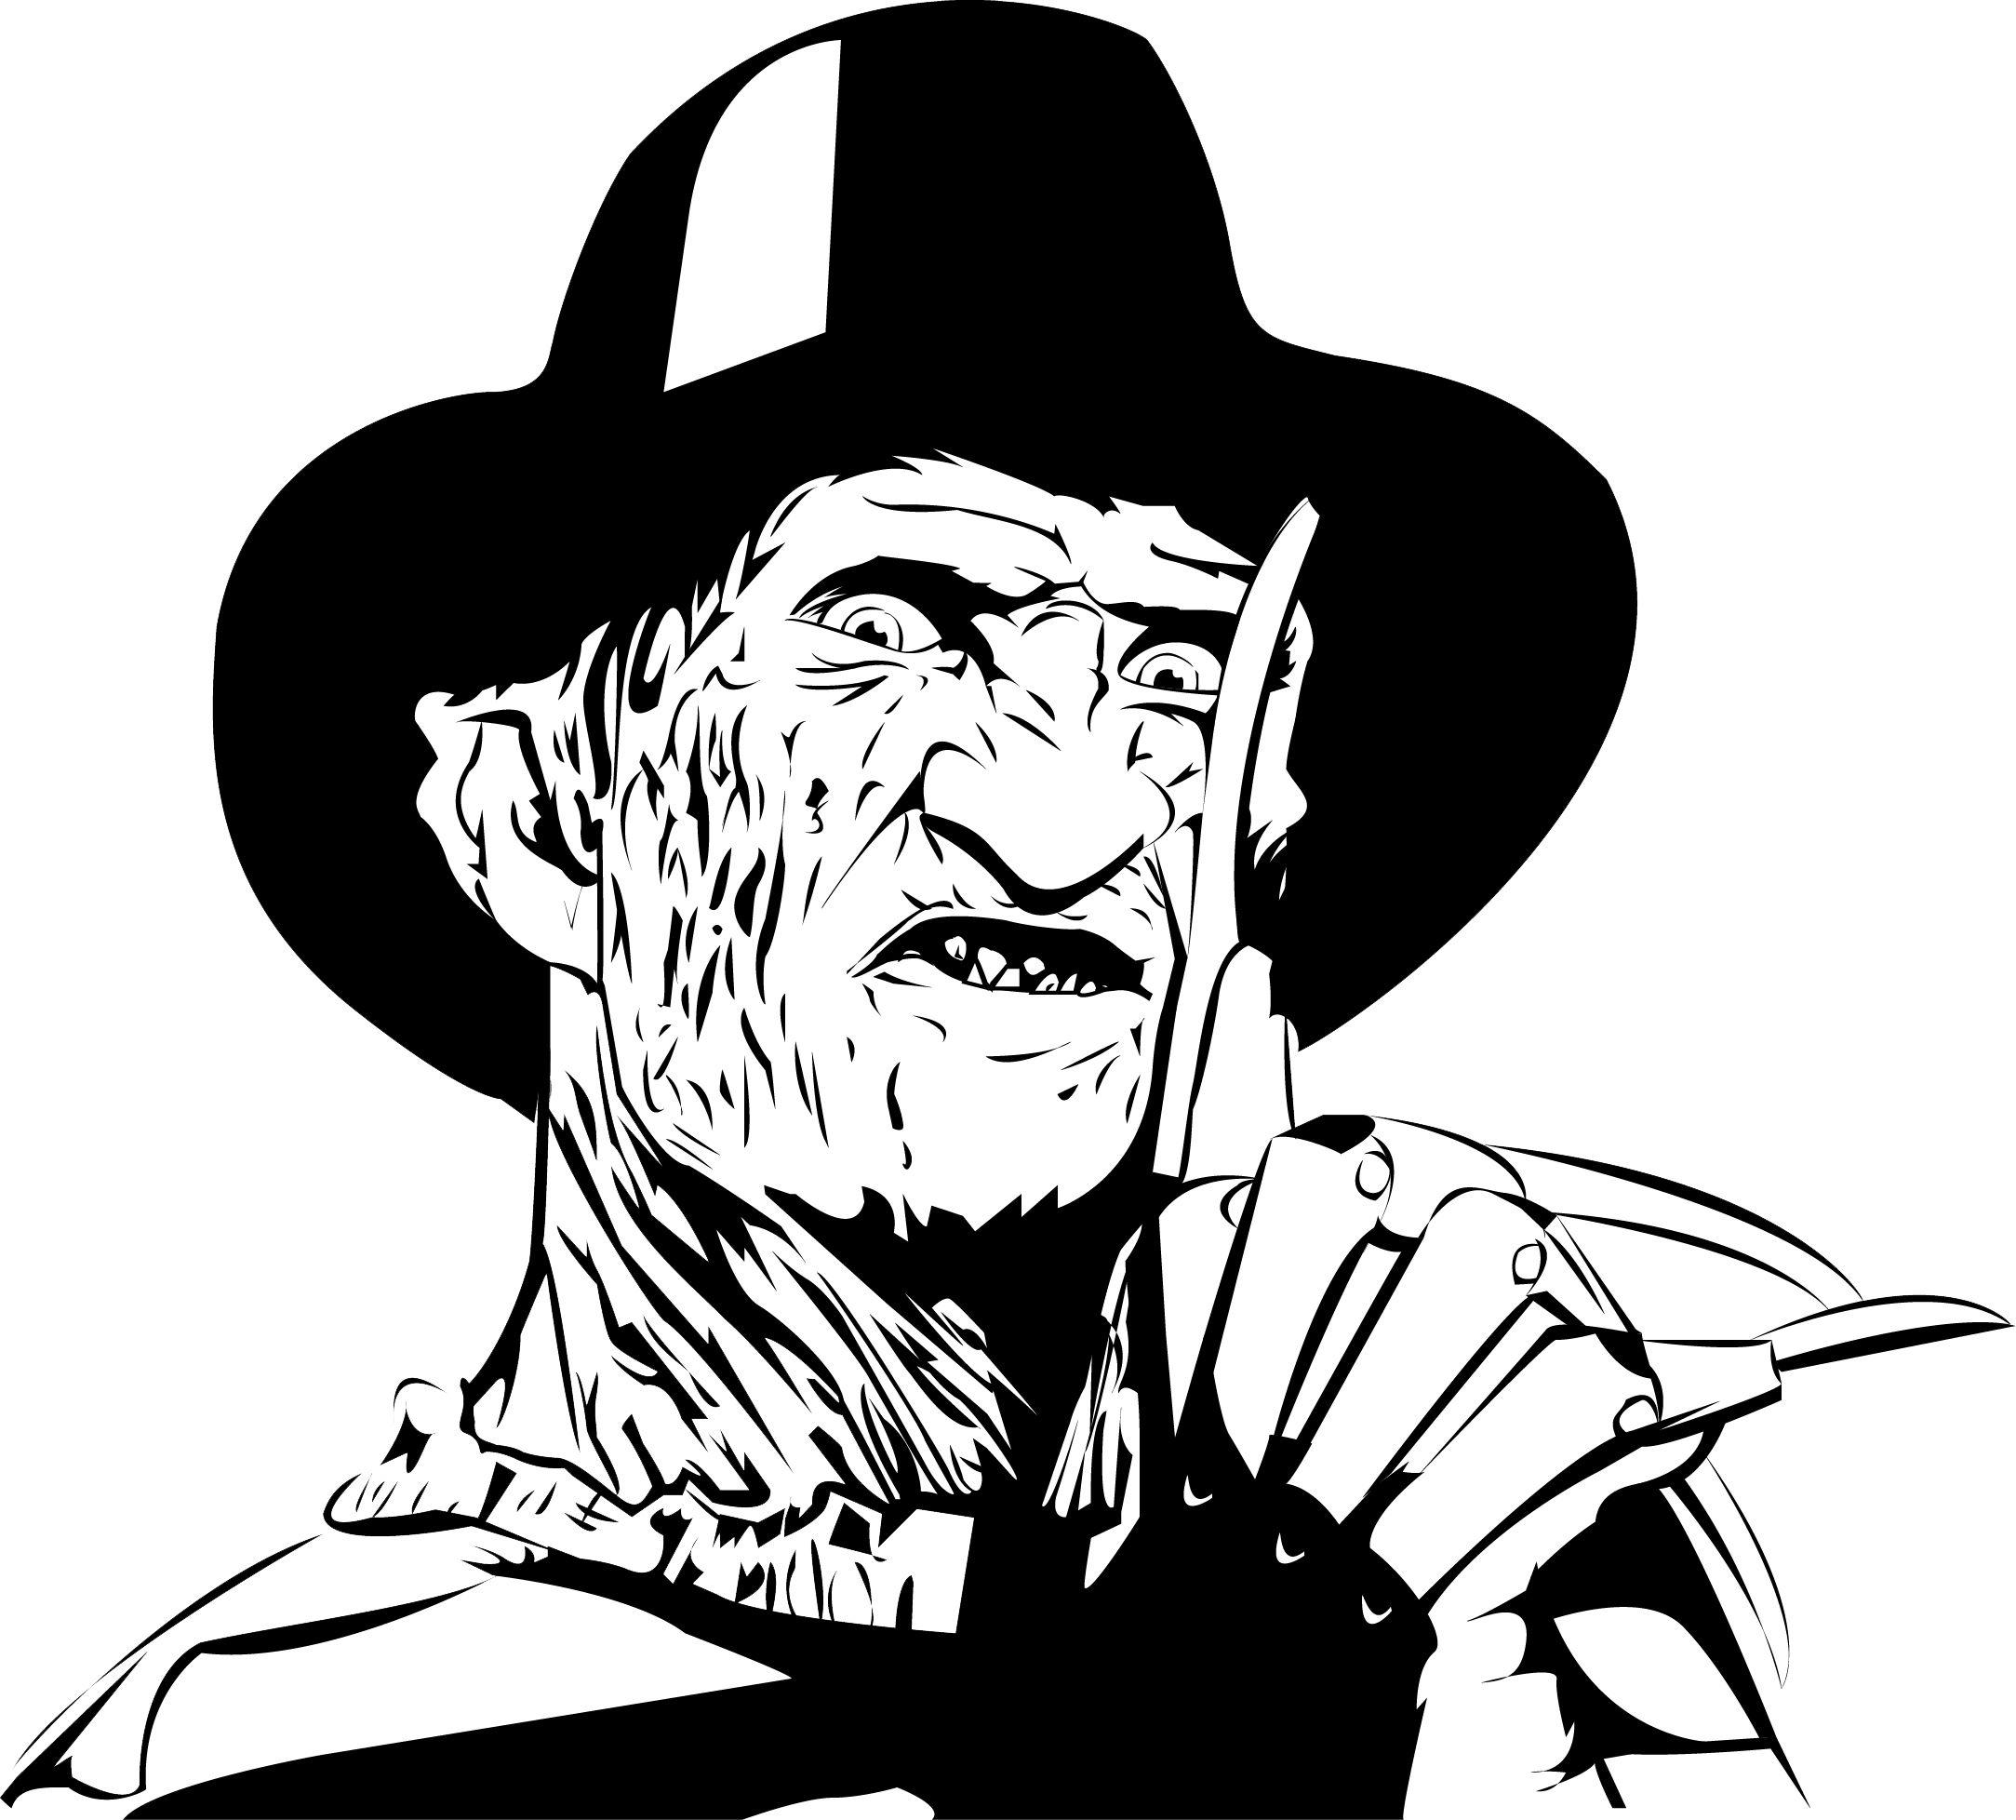 freddy Krueger | Horror, Terror, Sci Fi | Pinterest